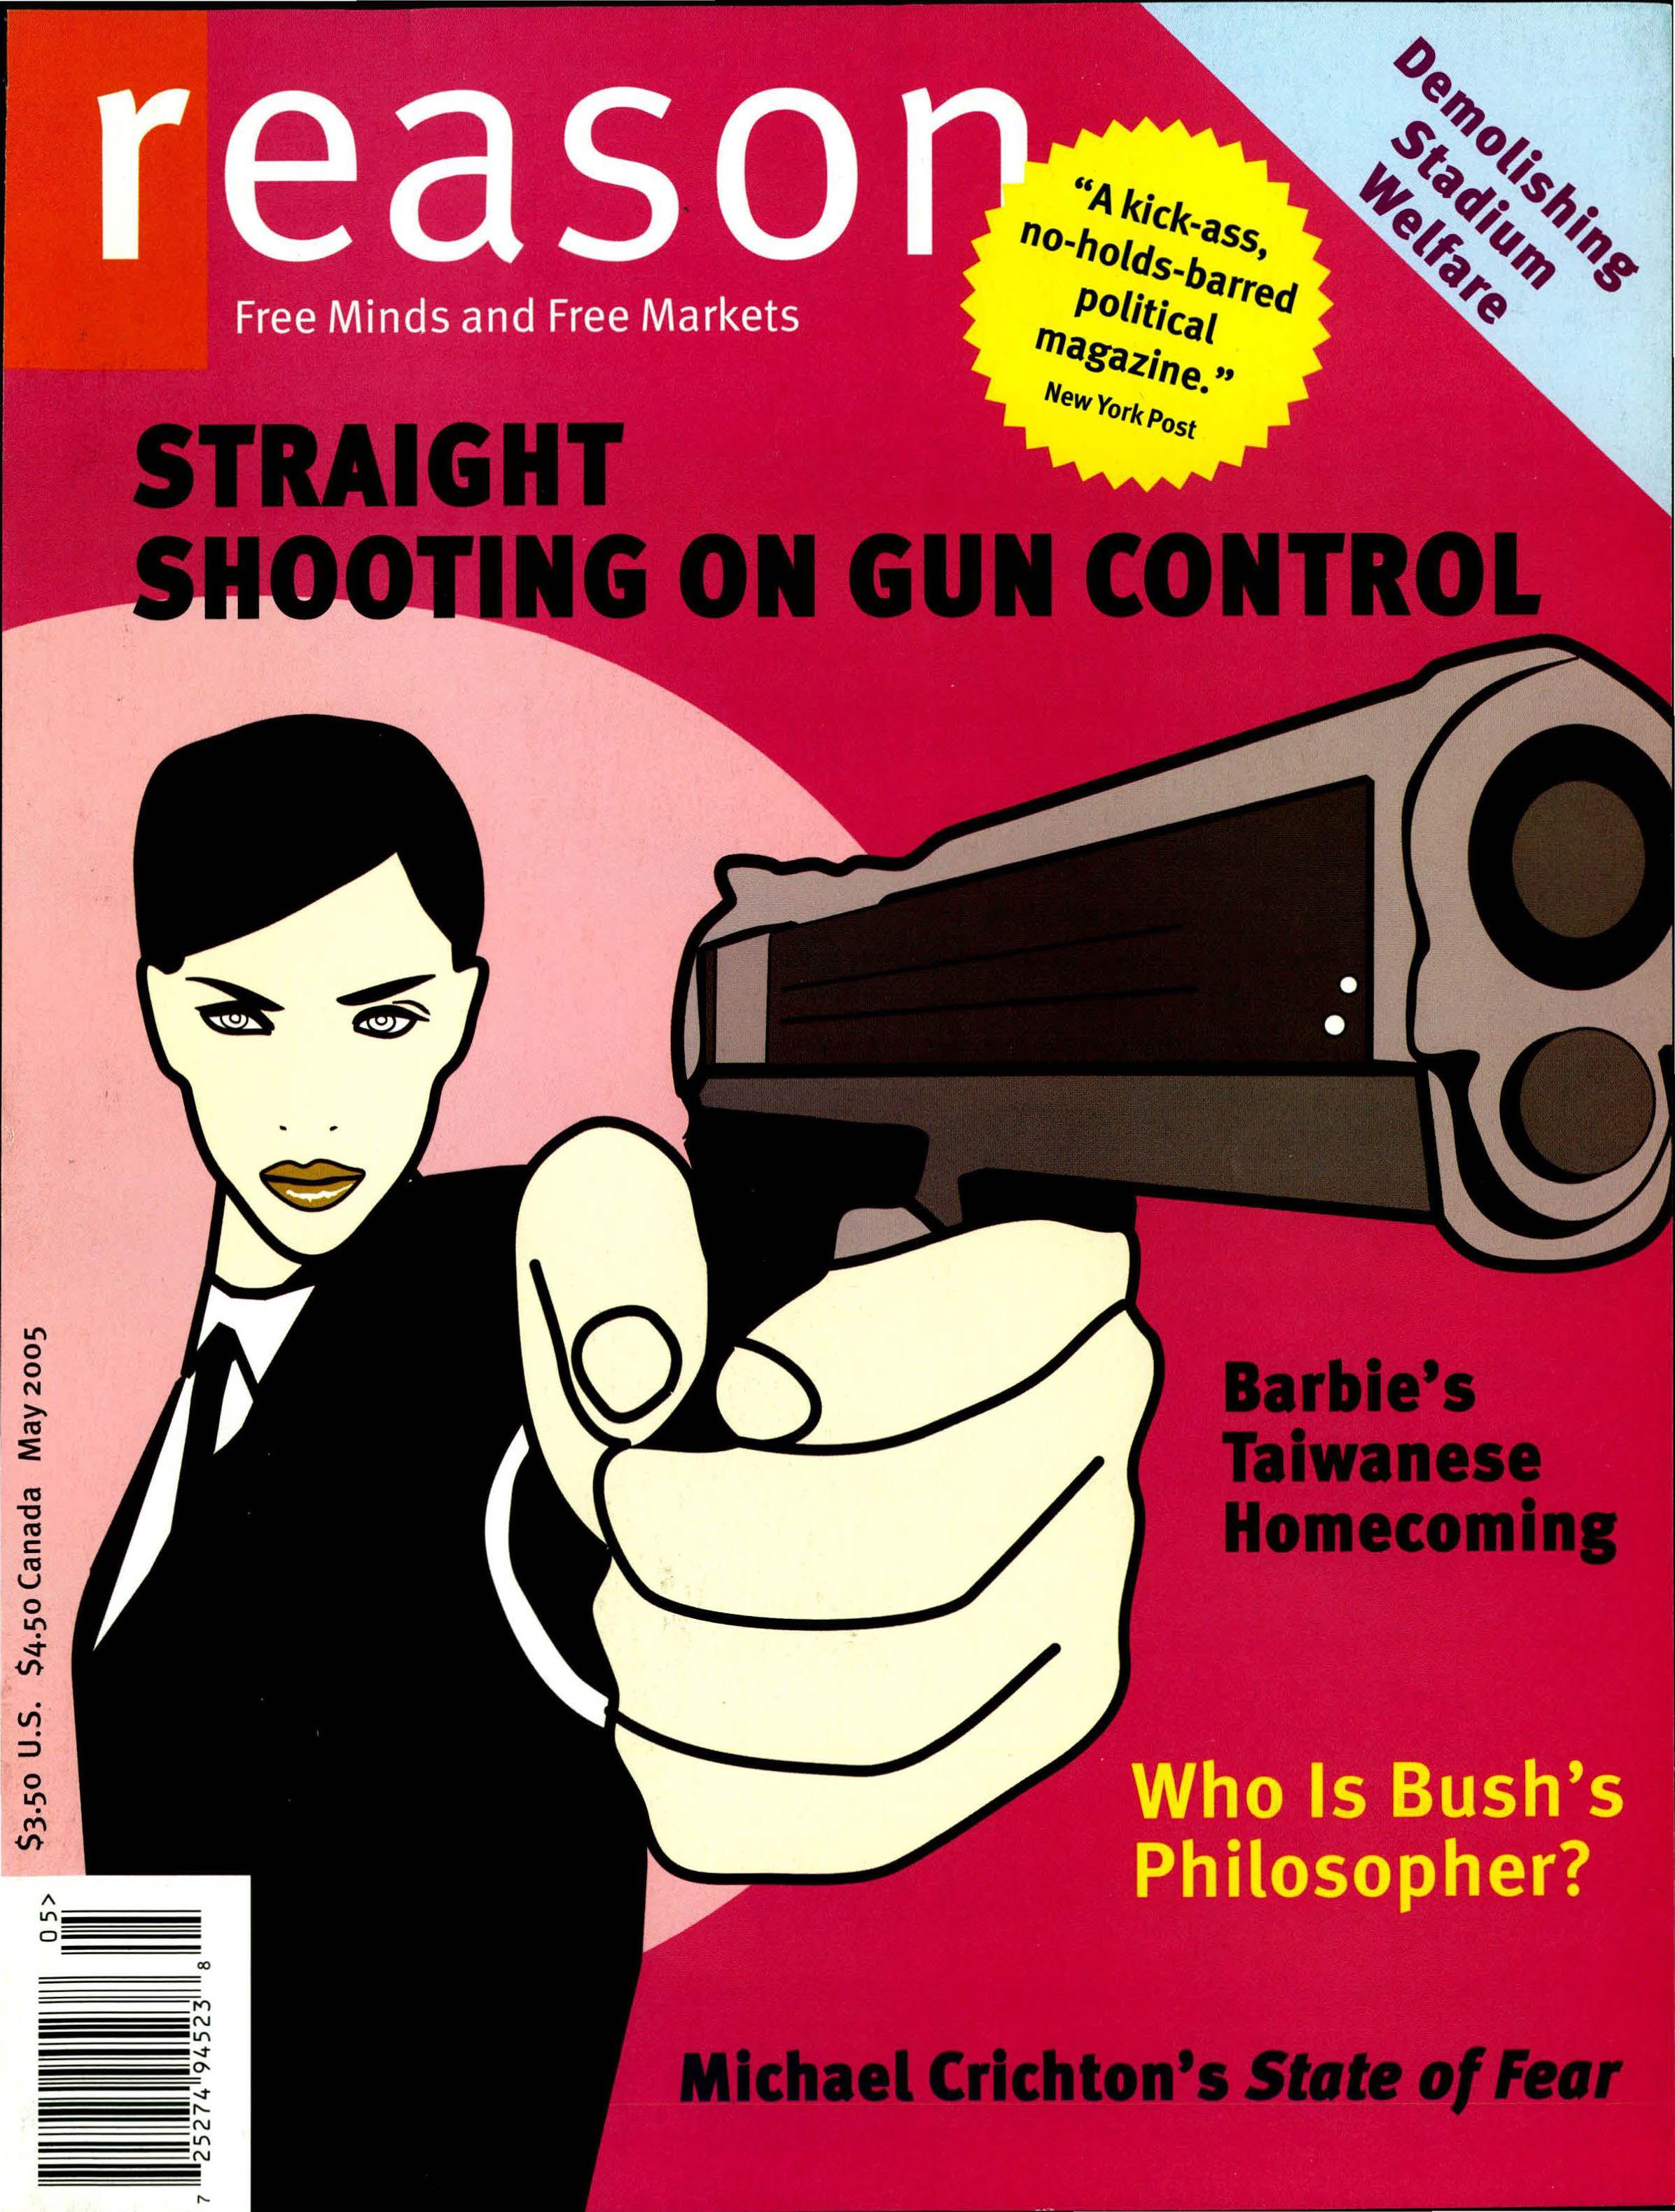 Reason Magazine, May 2005 cover image